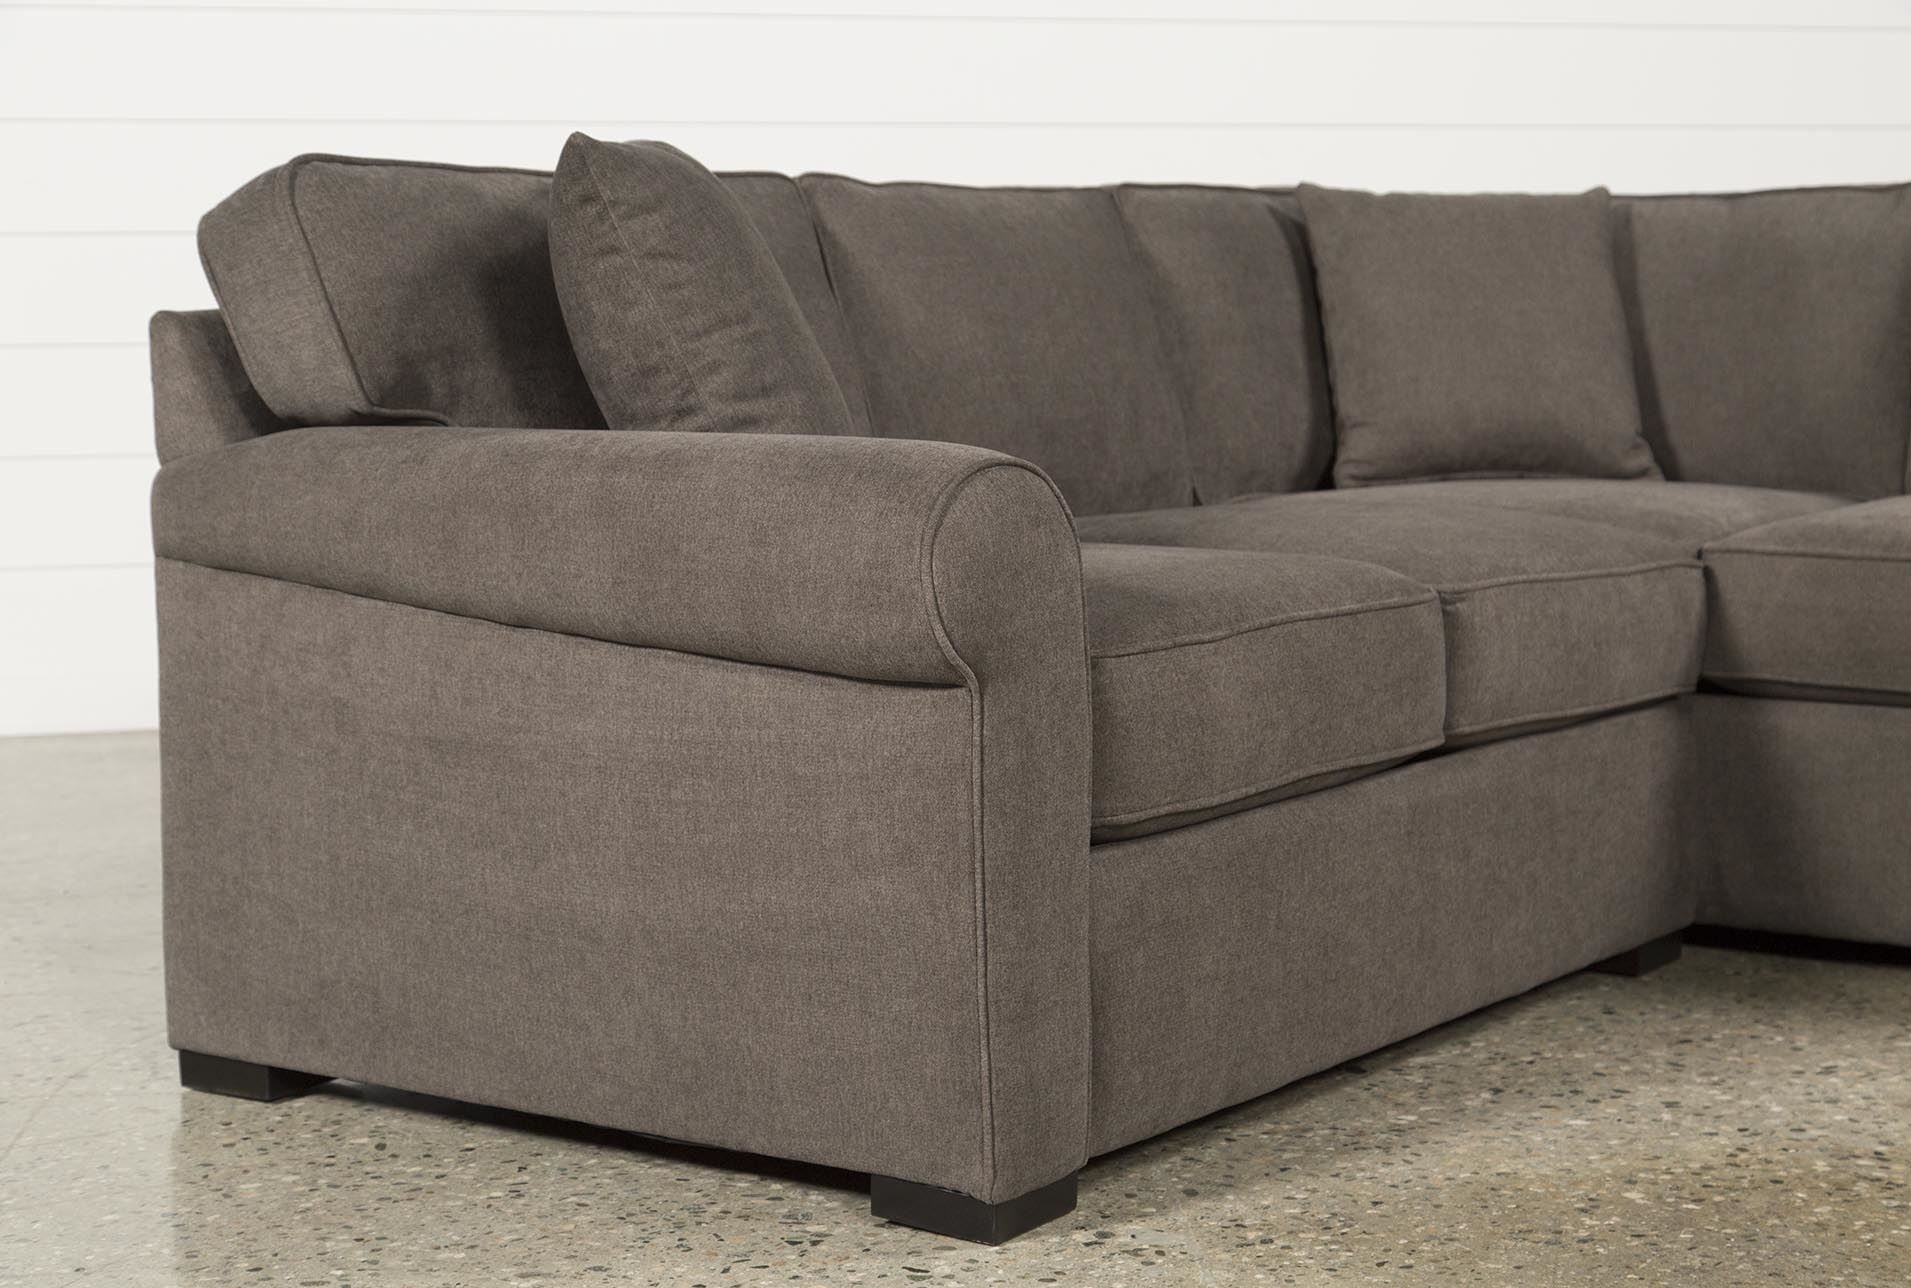 Elm Grande 2 Piece Sectional, Grey, Sofas | Room Inspiration Regarding Elm Grande Ii 2 Piece Sectionals (View 2 of 25)